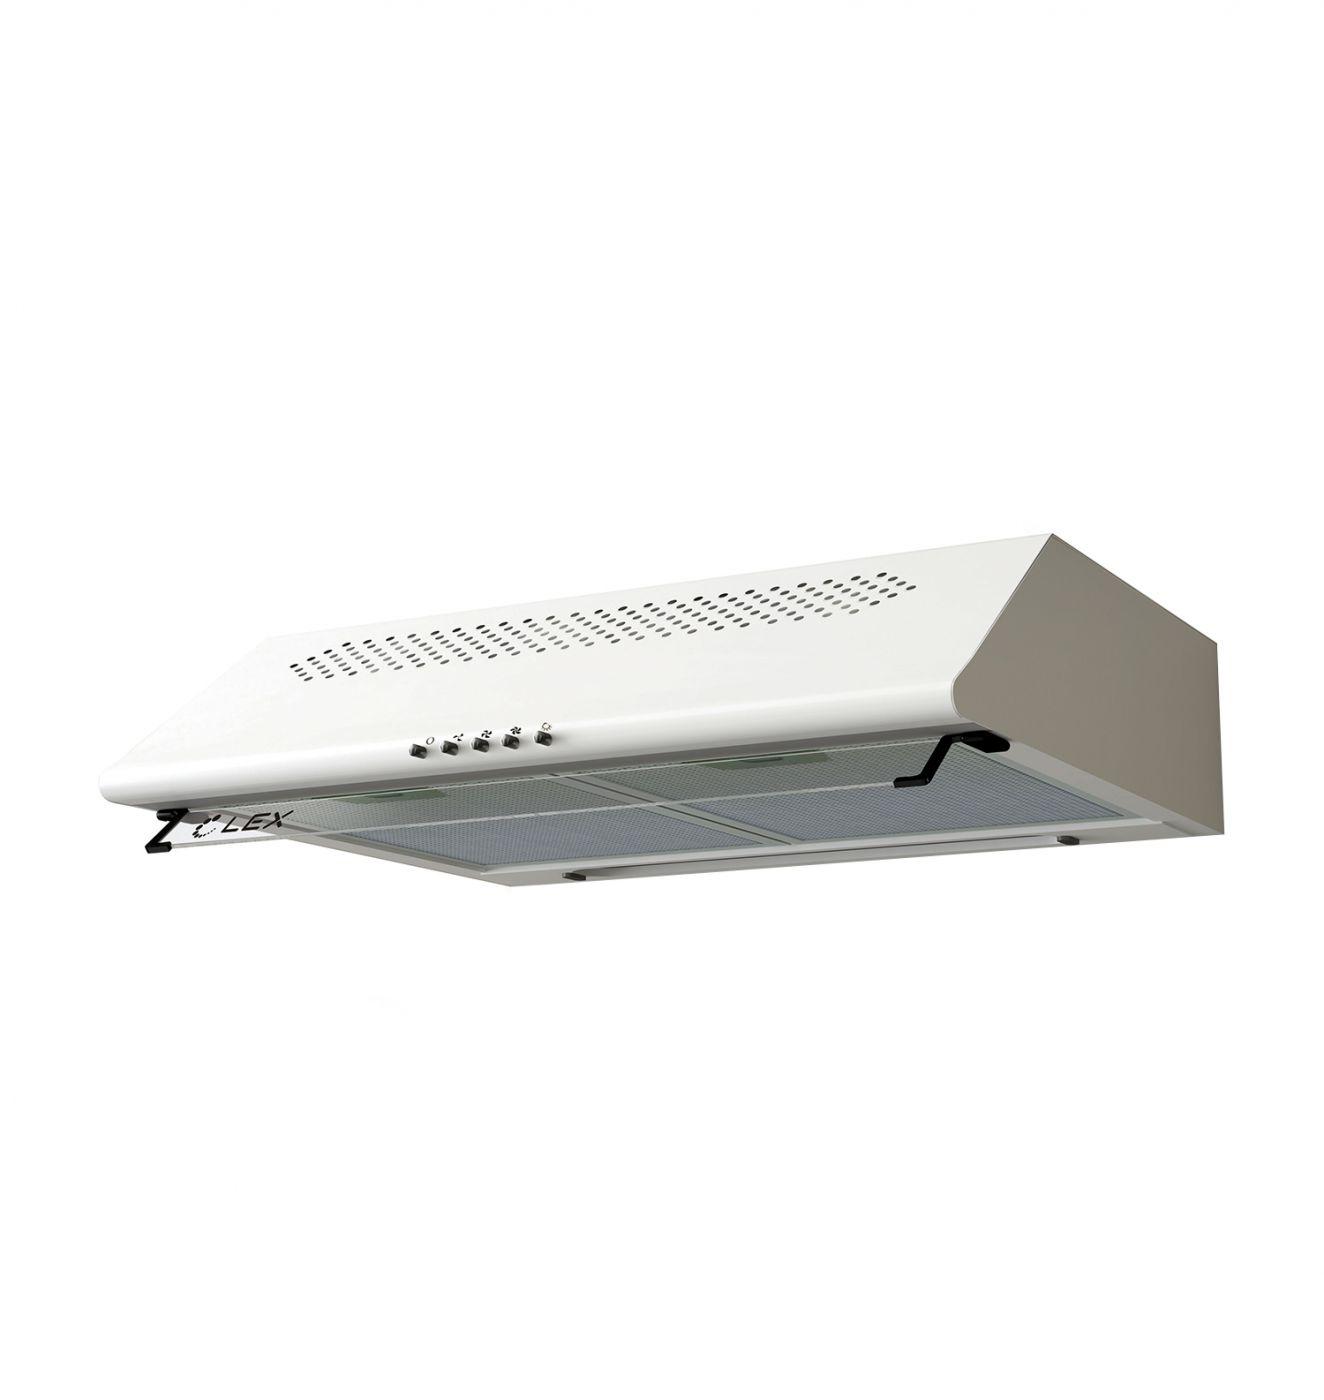 Подвесная вытяжка LEX Simple 600 White (CHAT000017)